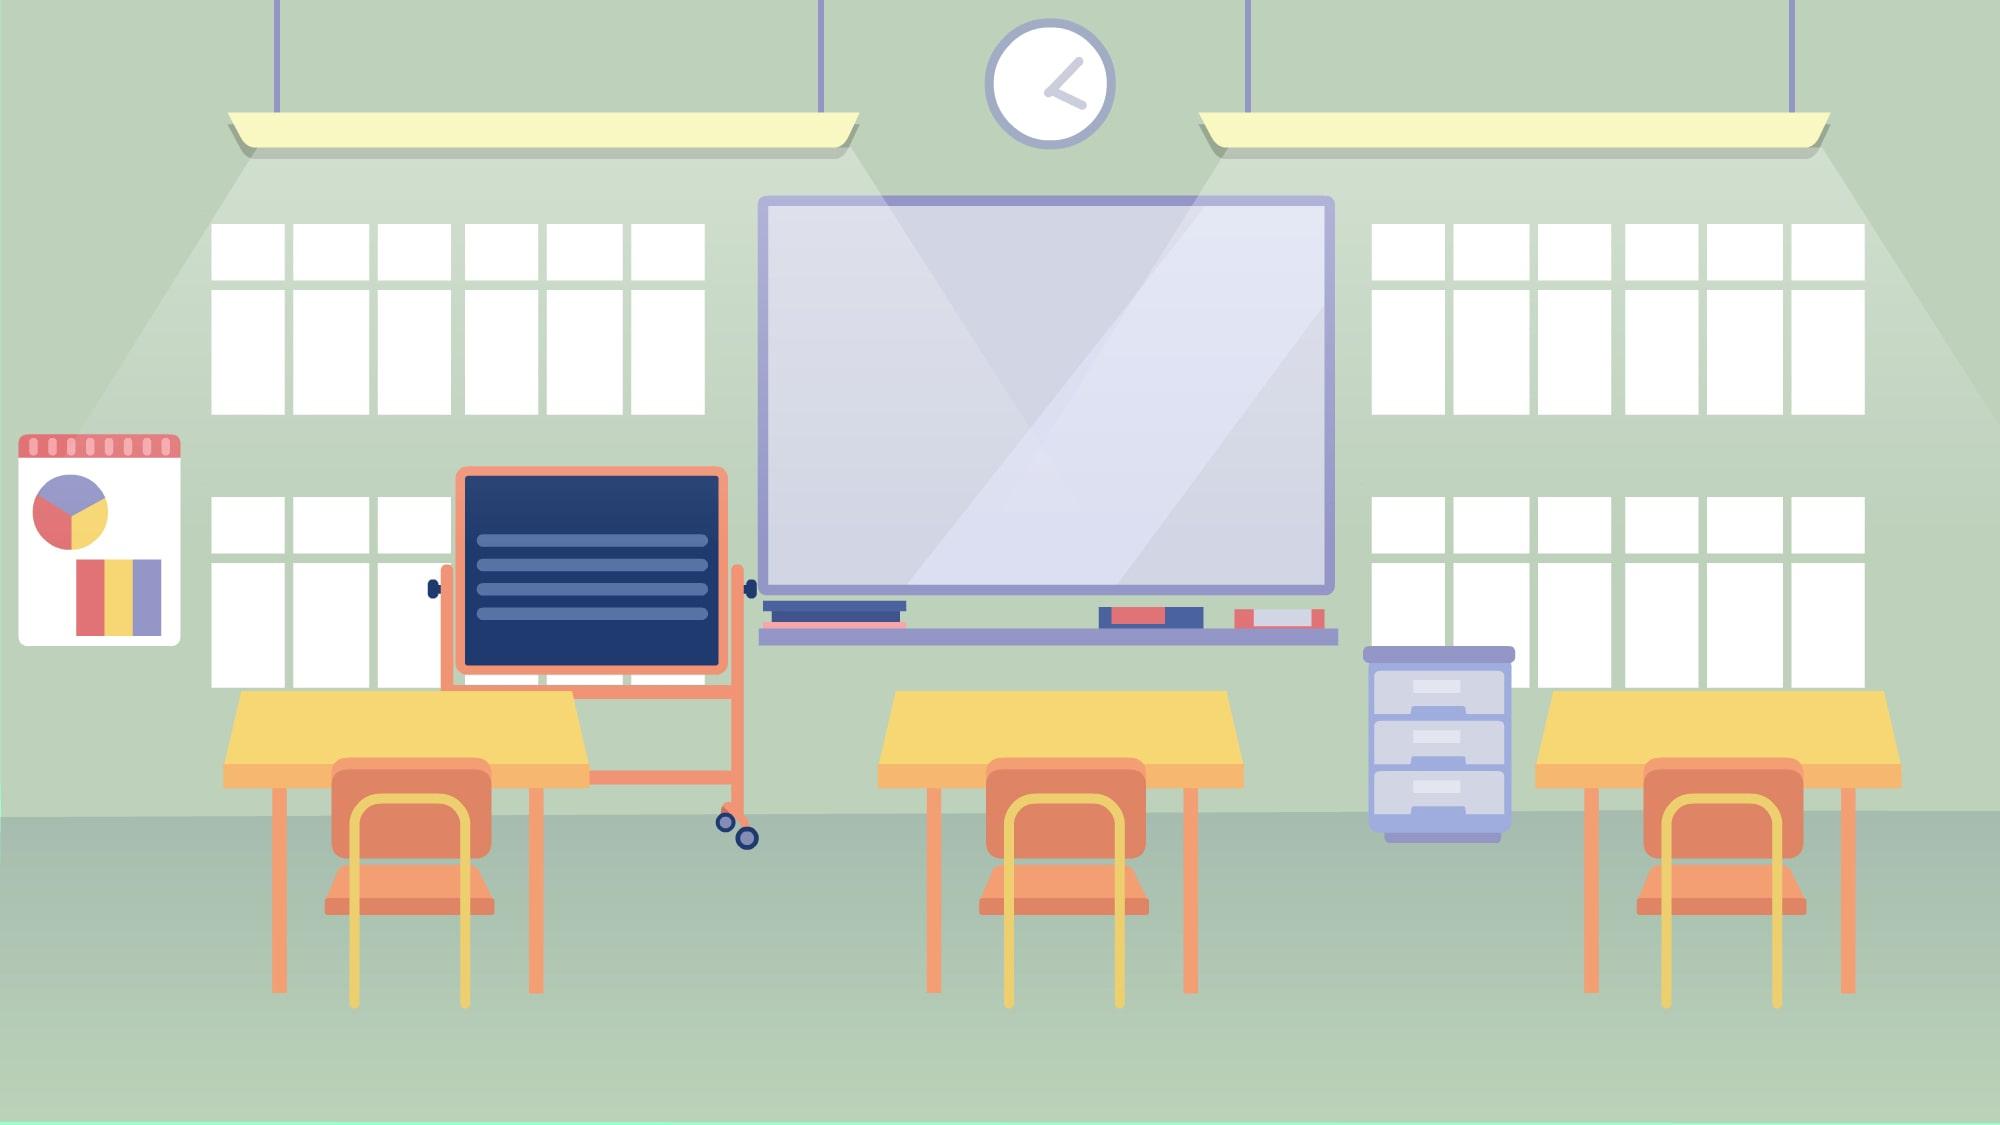 School illustration for a film